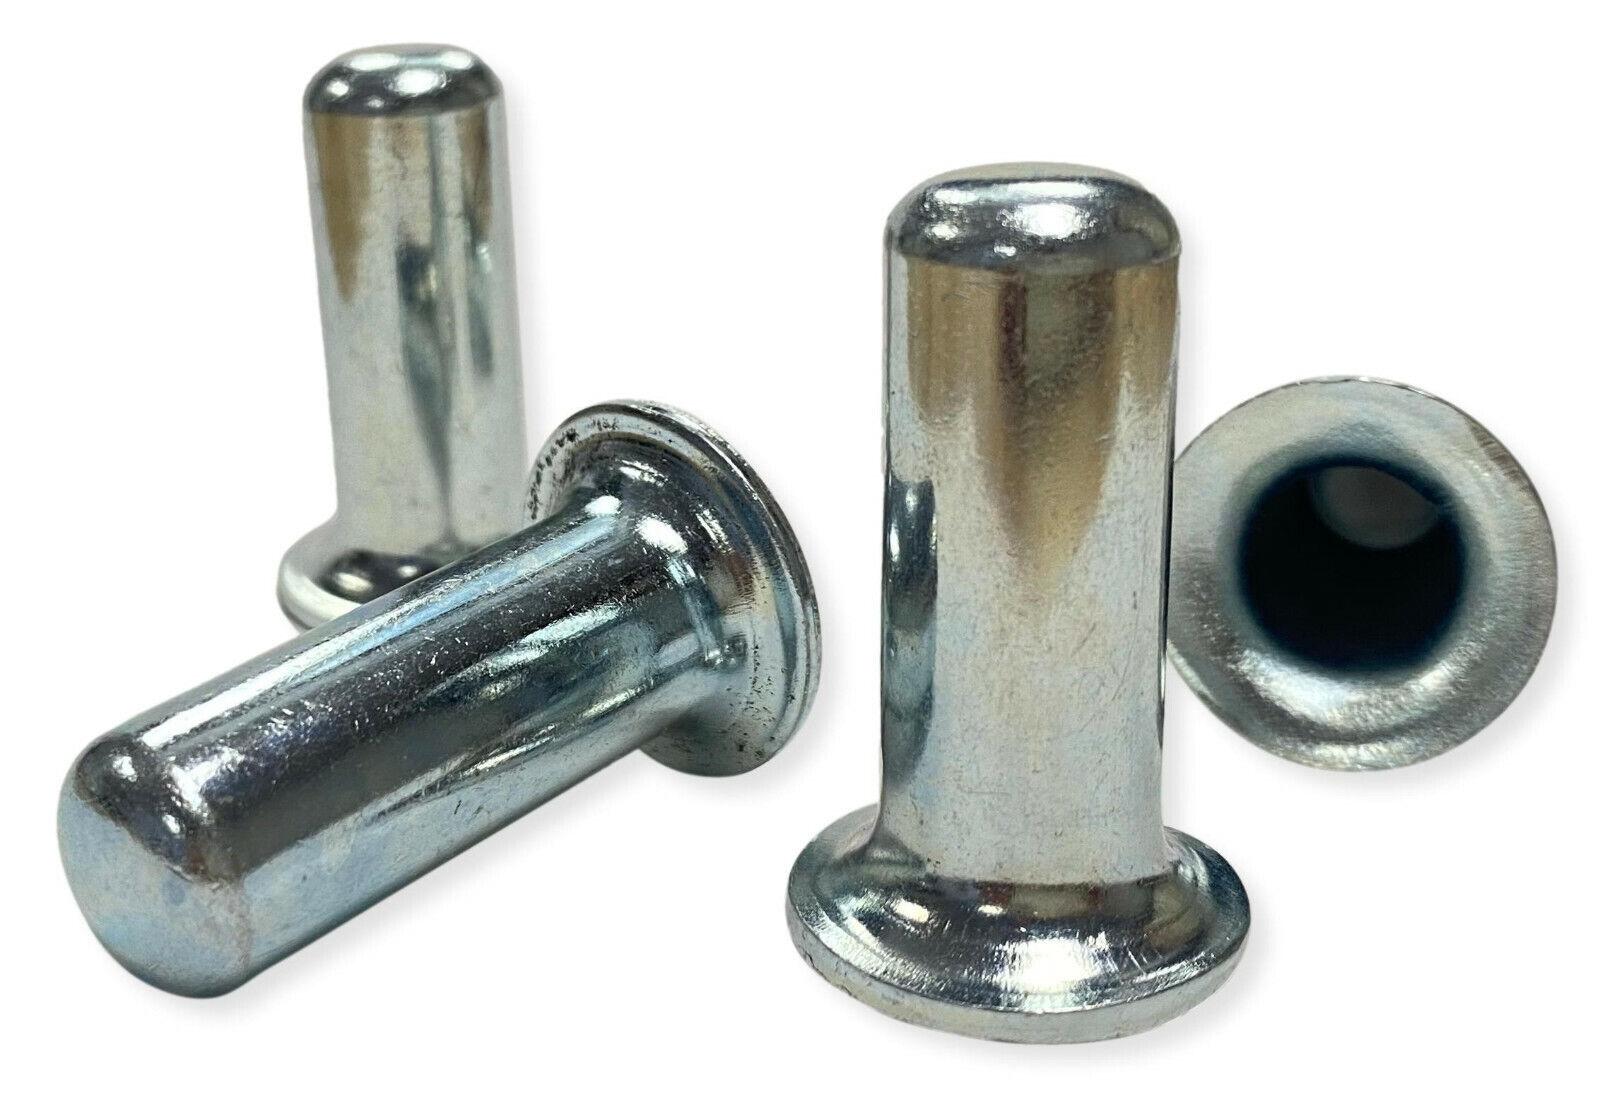 Steel Friction Grip Metal Caster Socket Inserts, 9/16″ OD – Set of 4 Business & Industrial